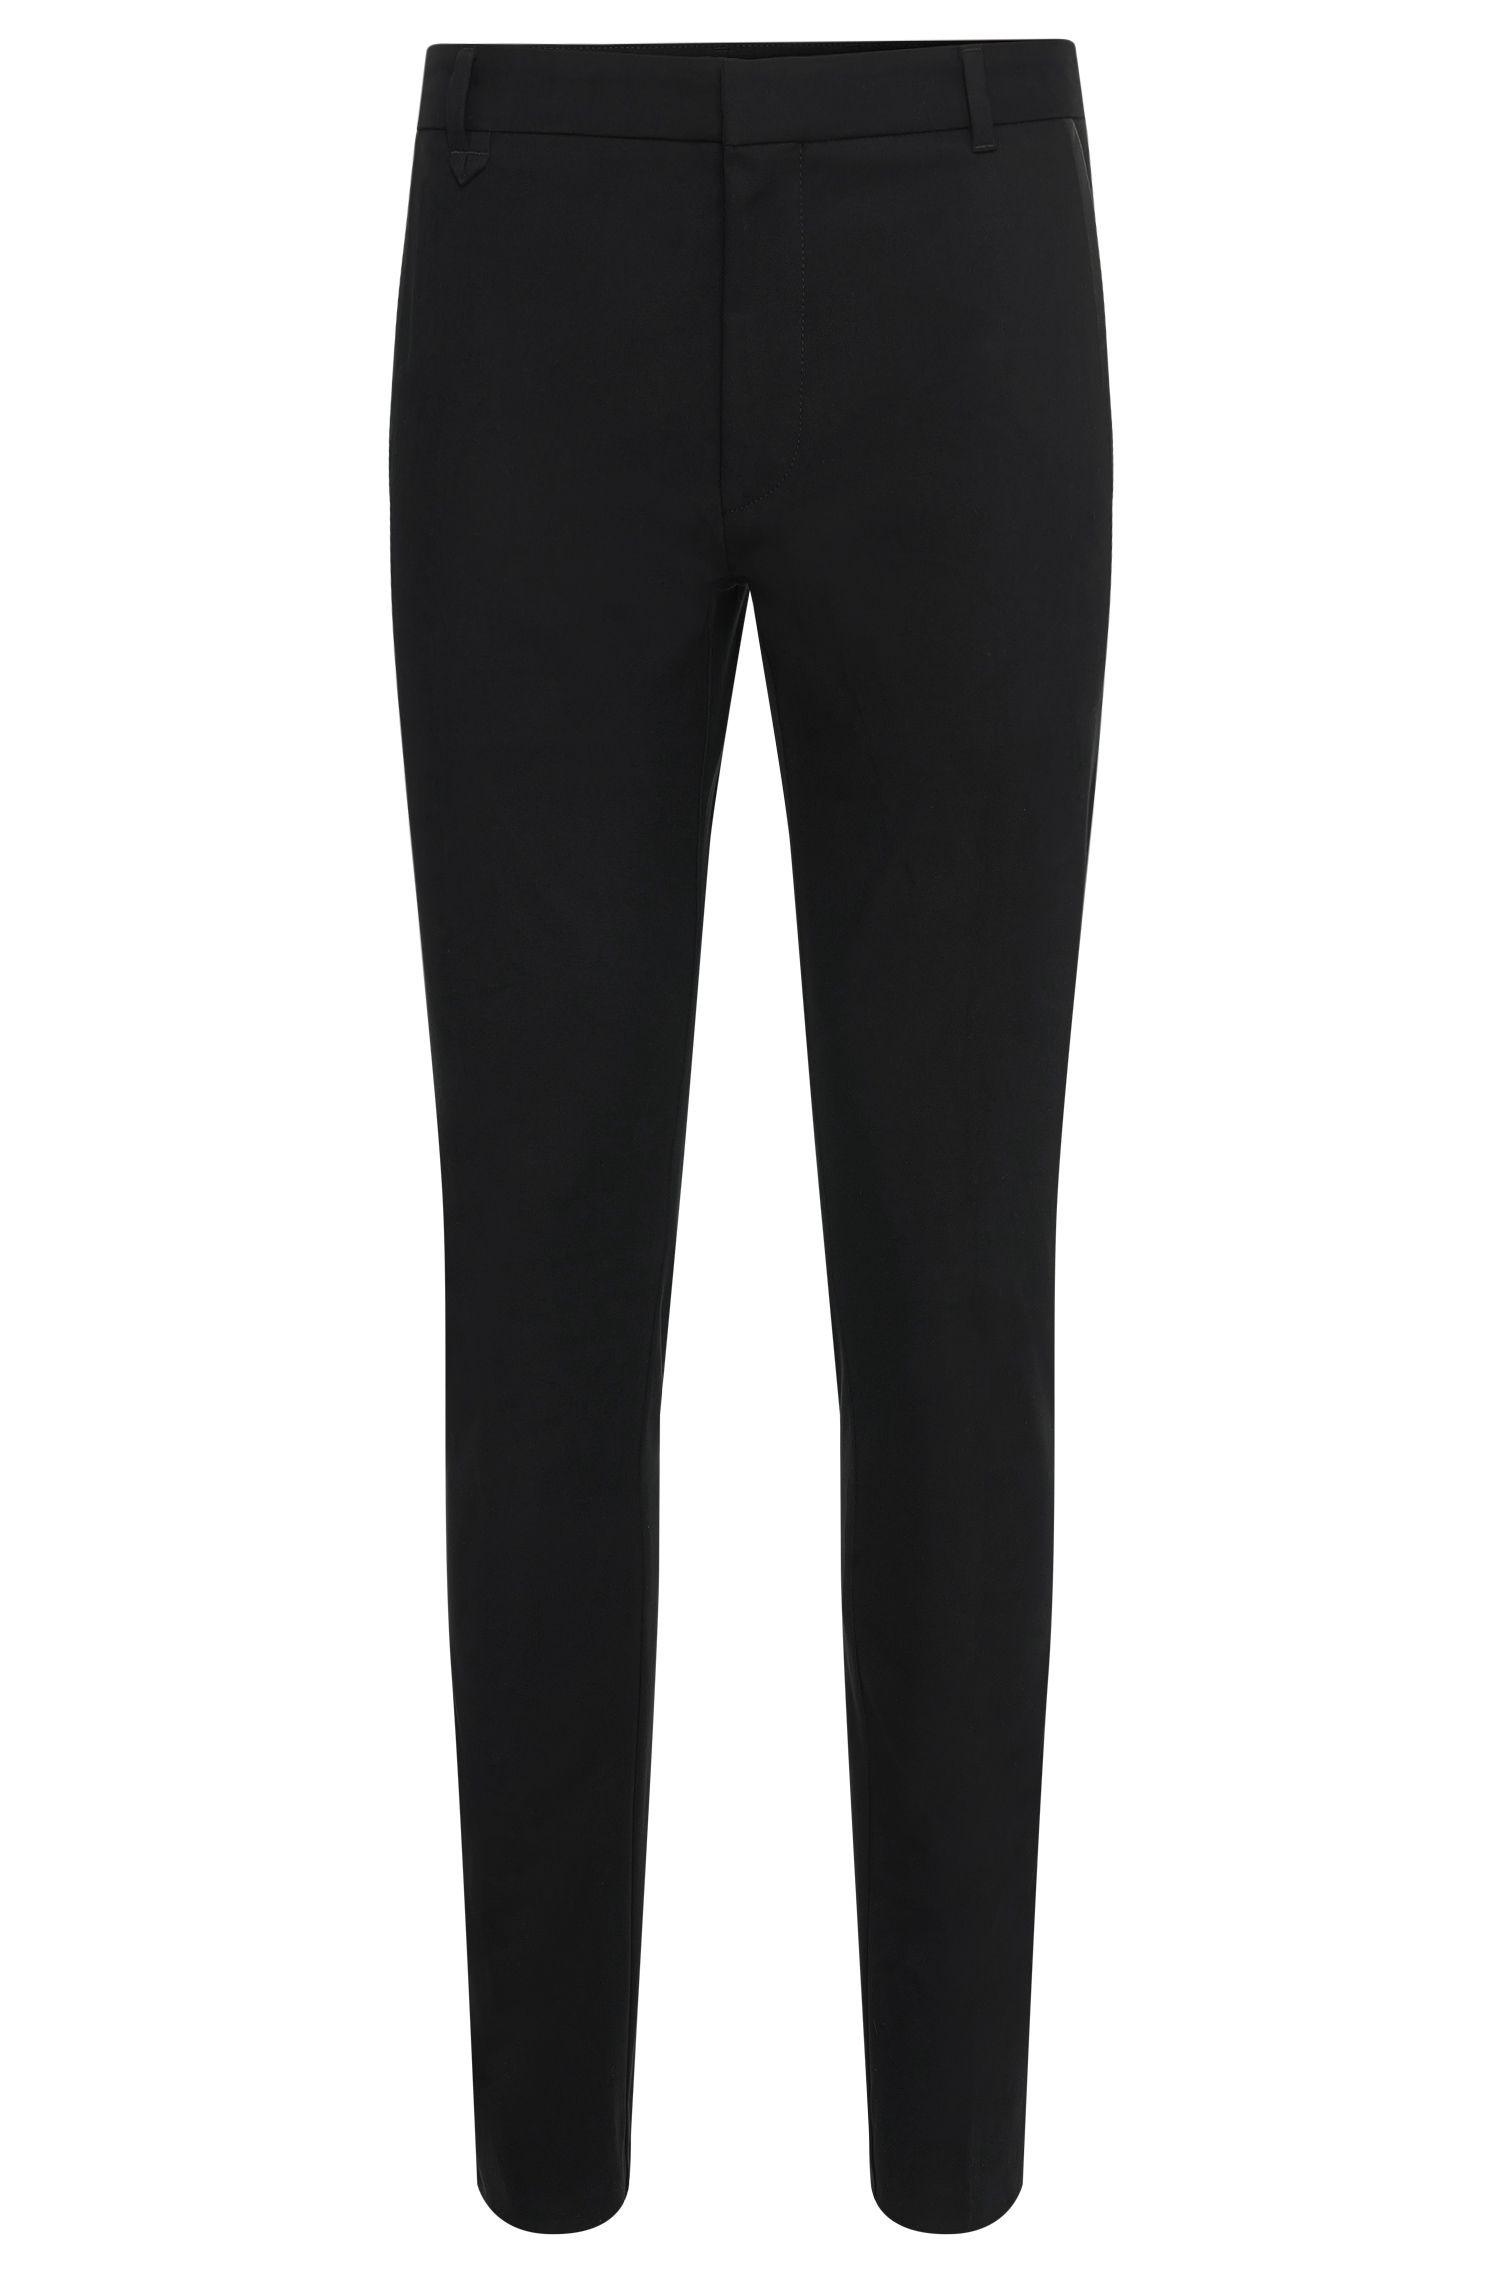 'Halyk' | Extra Slim Fit, Stretch Cotton Vegan Leather Trim Pants